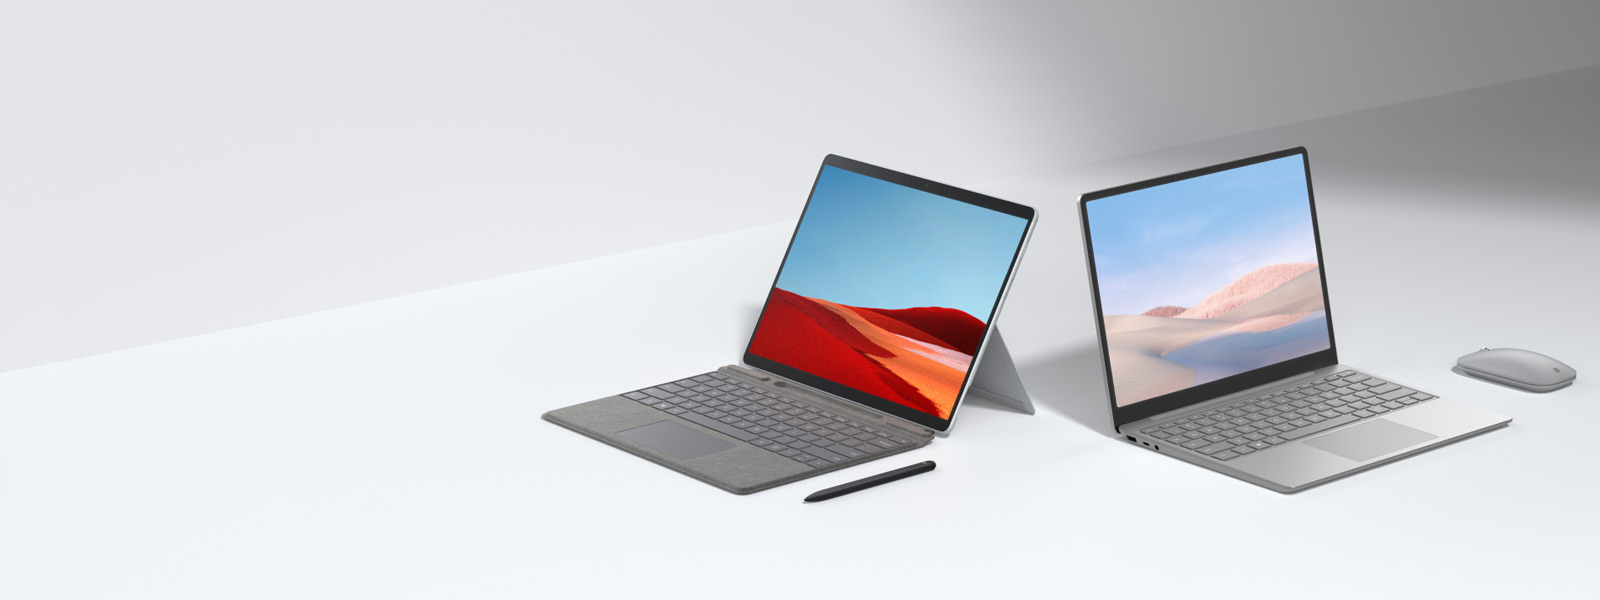 Windows 10 笔记本电脑系列